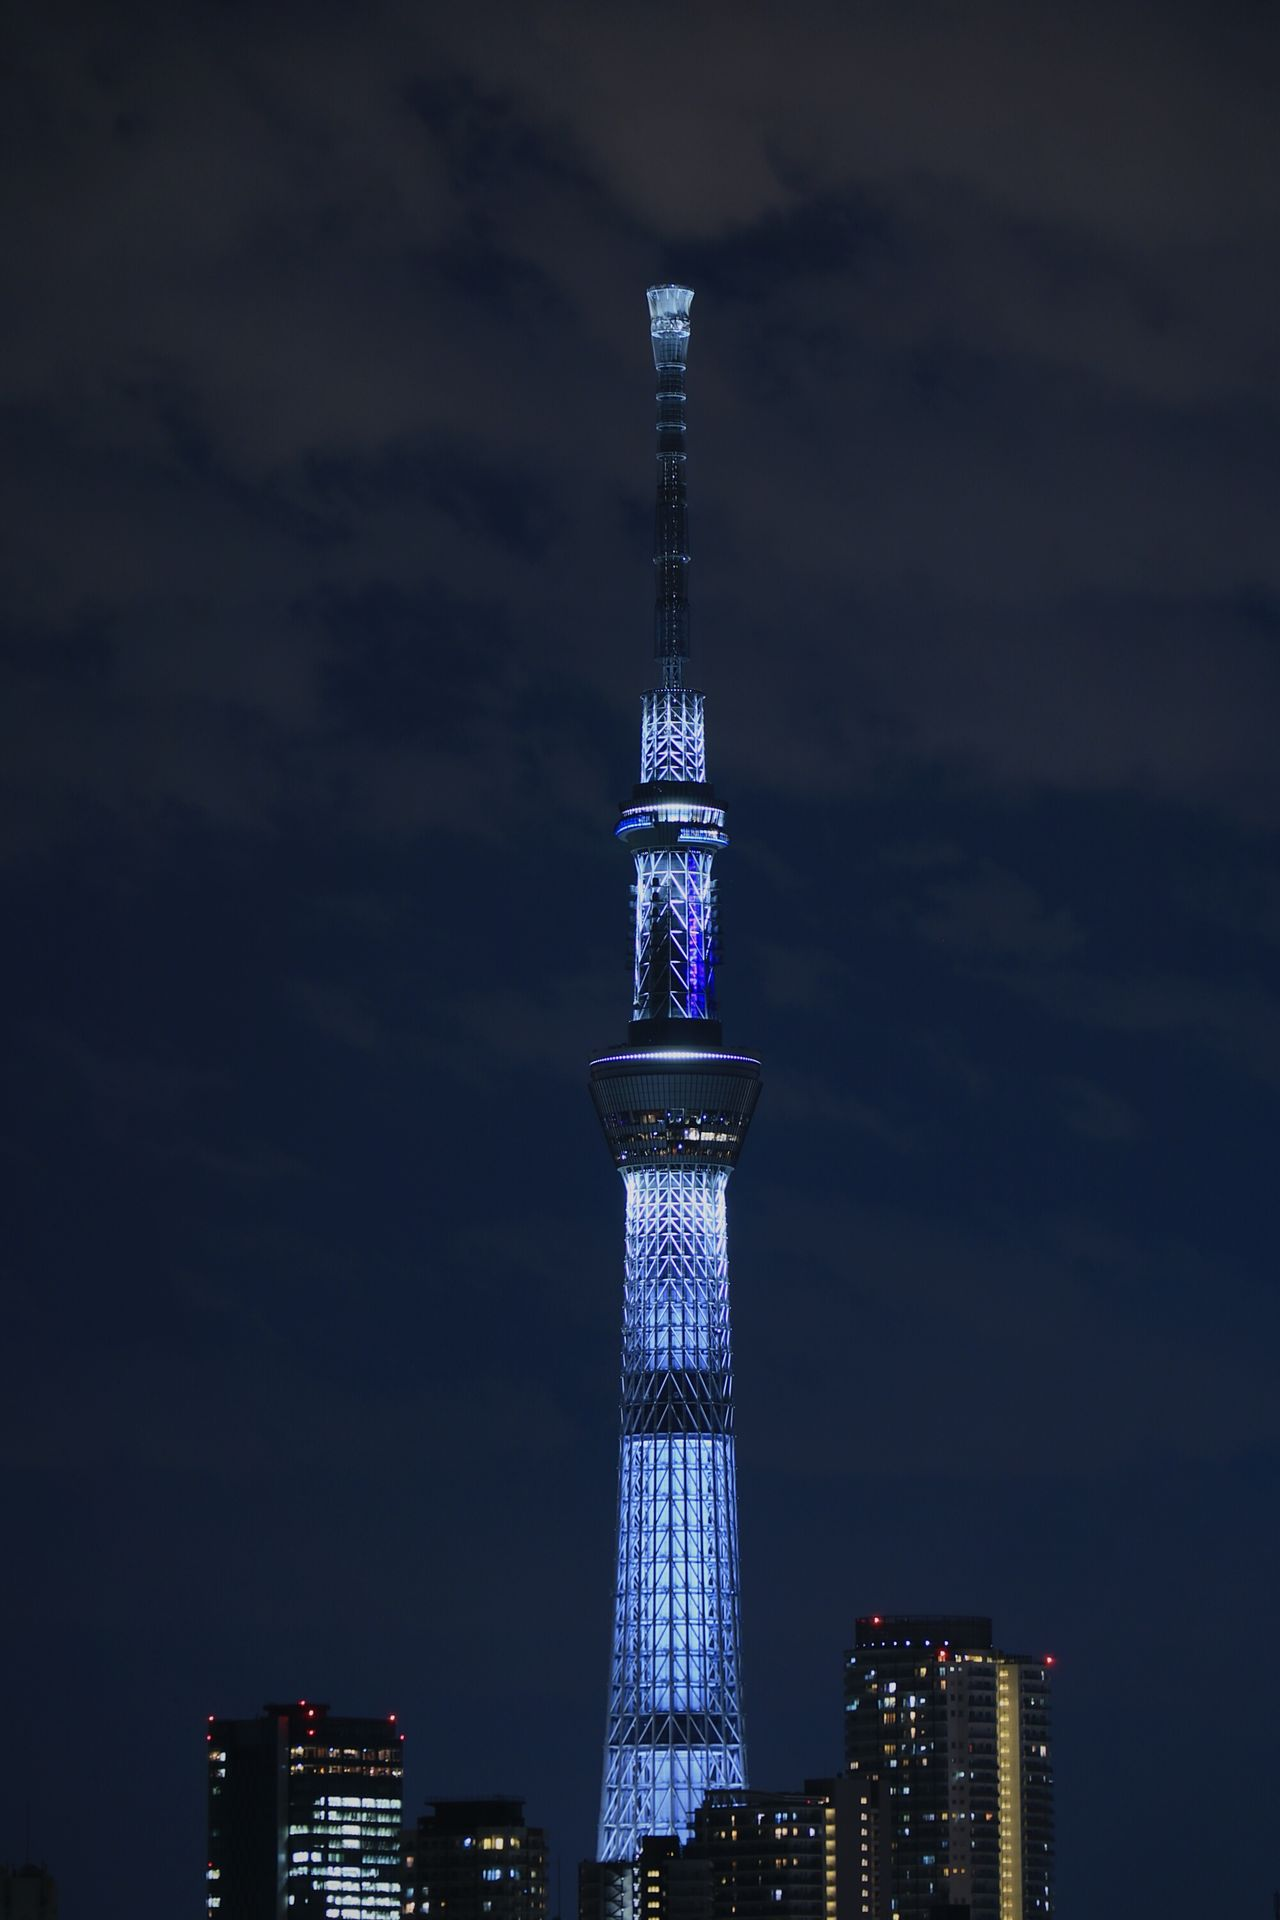 Tower Tall - High Urban Landscape Skyscraper Skytree Tokyoskytree Japan Tokyo Illuminated Nightscape Nightphotography Nightview Night